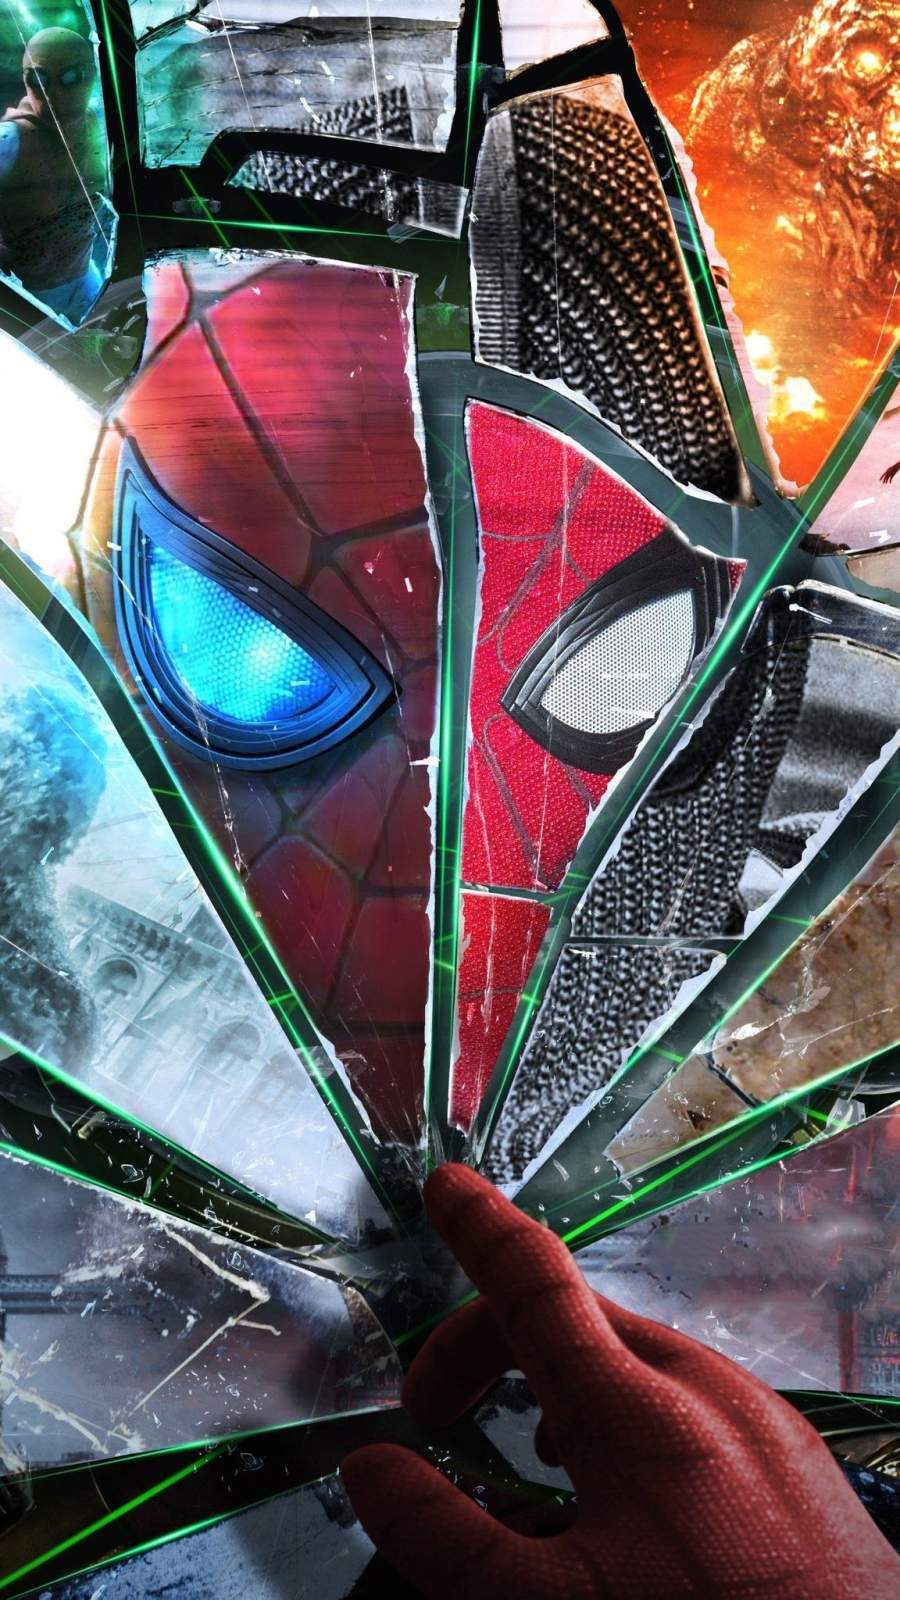 Spider Man Art Broken Glass Iphone Wallpaper Spiderman Art